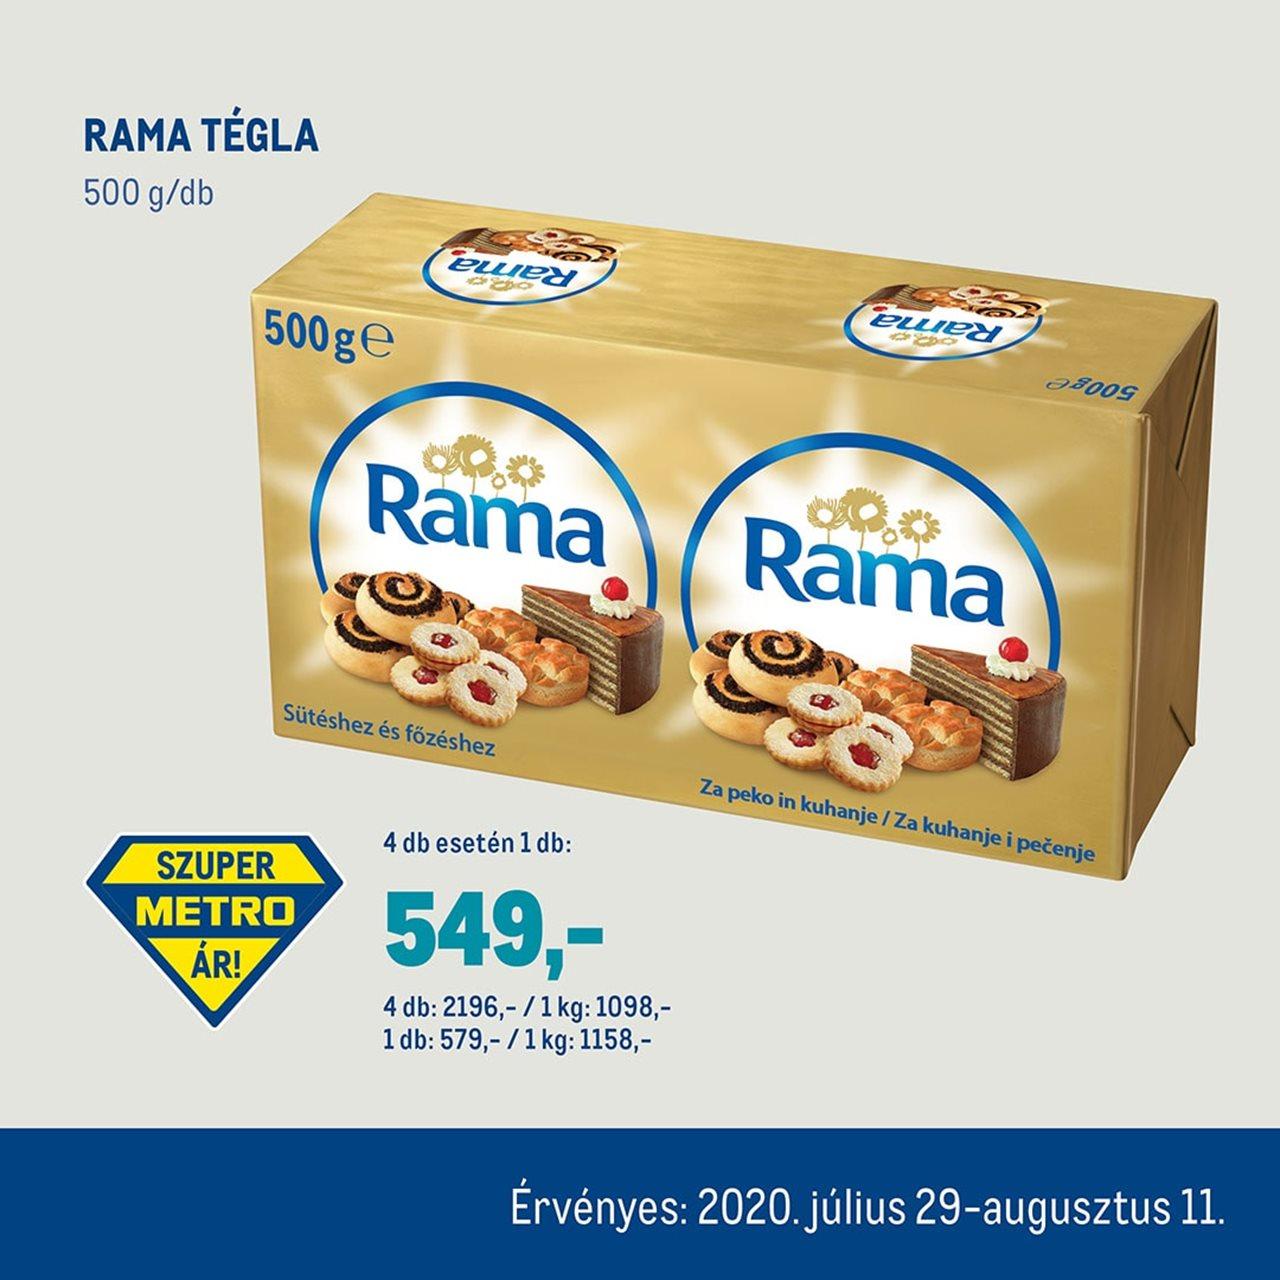 Rama tégla